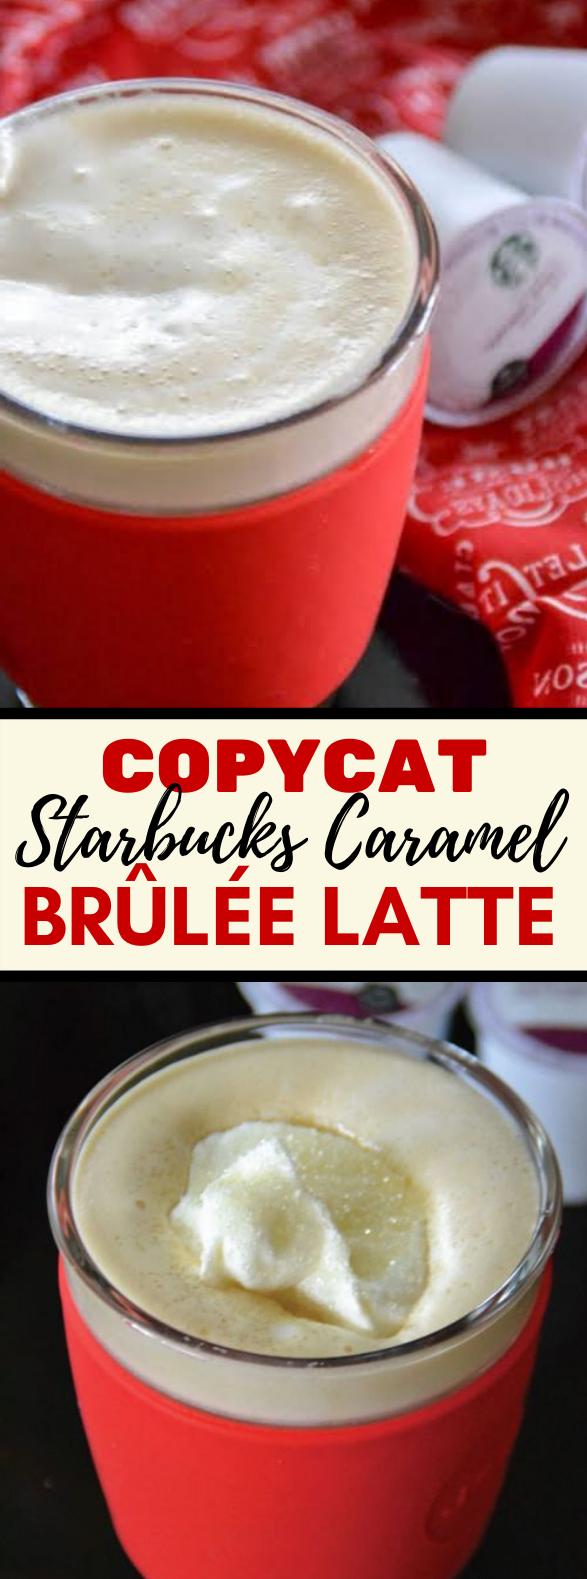 COPYCAT STARBUCKS CARAMEL BRÛLÉE LATTE RECIPE #drinks #holidaydrink